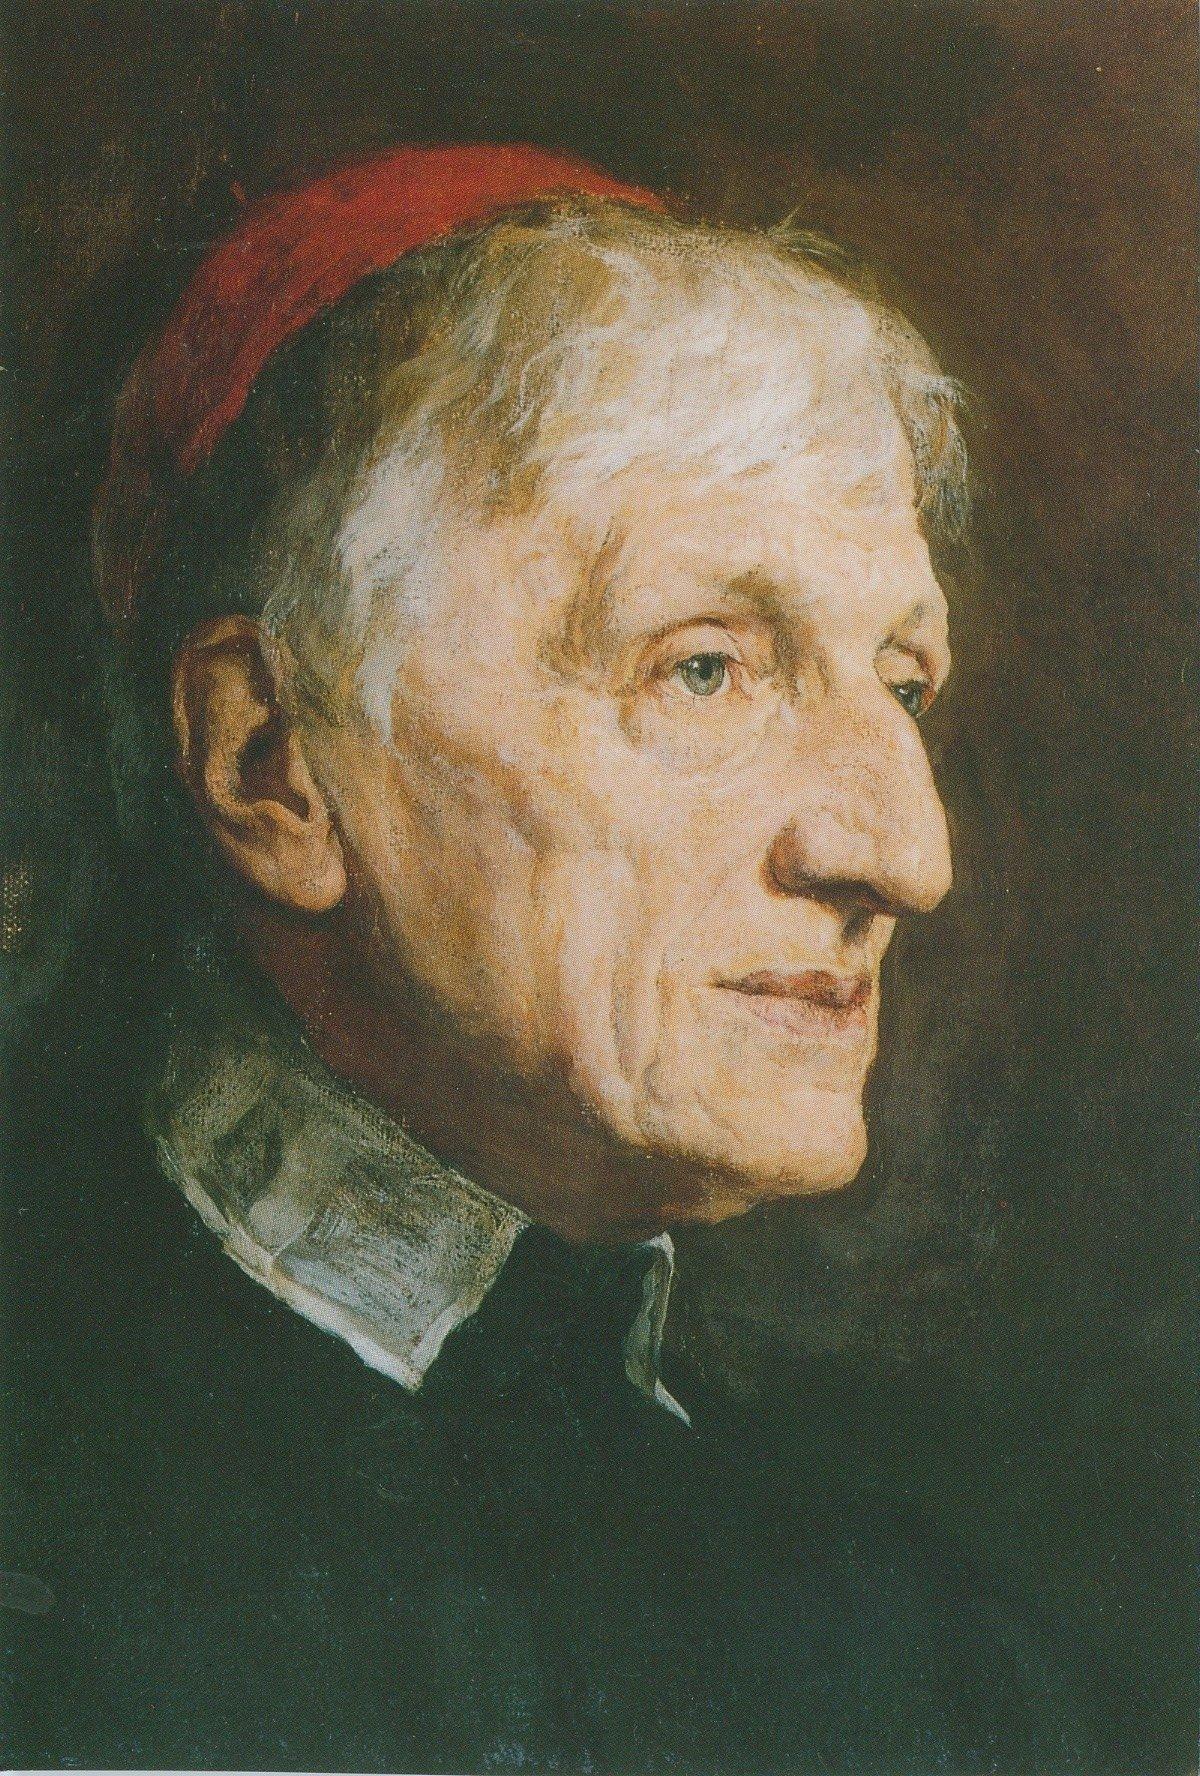 10 Awesome John Henry Newman The Idea Of A University cardinal newmans gentleman blessed cardinal john henry newman